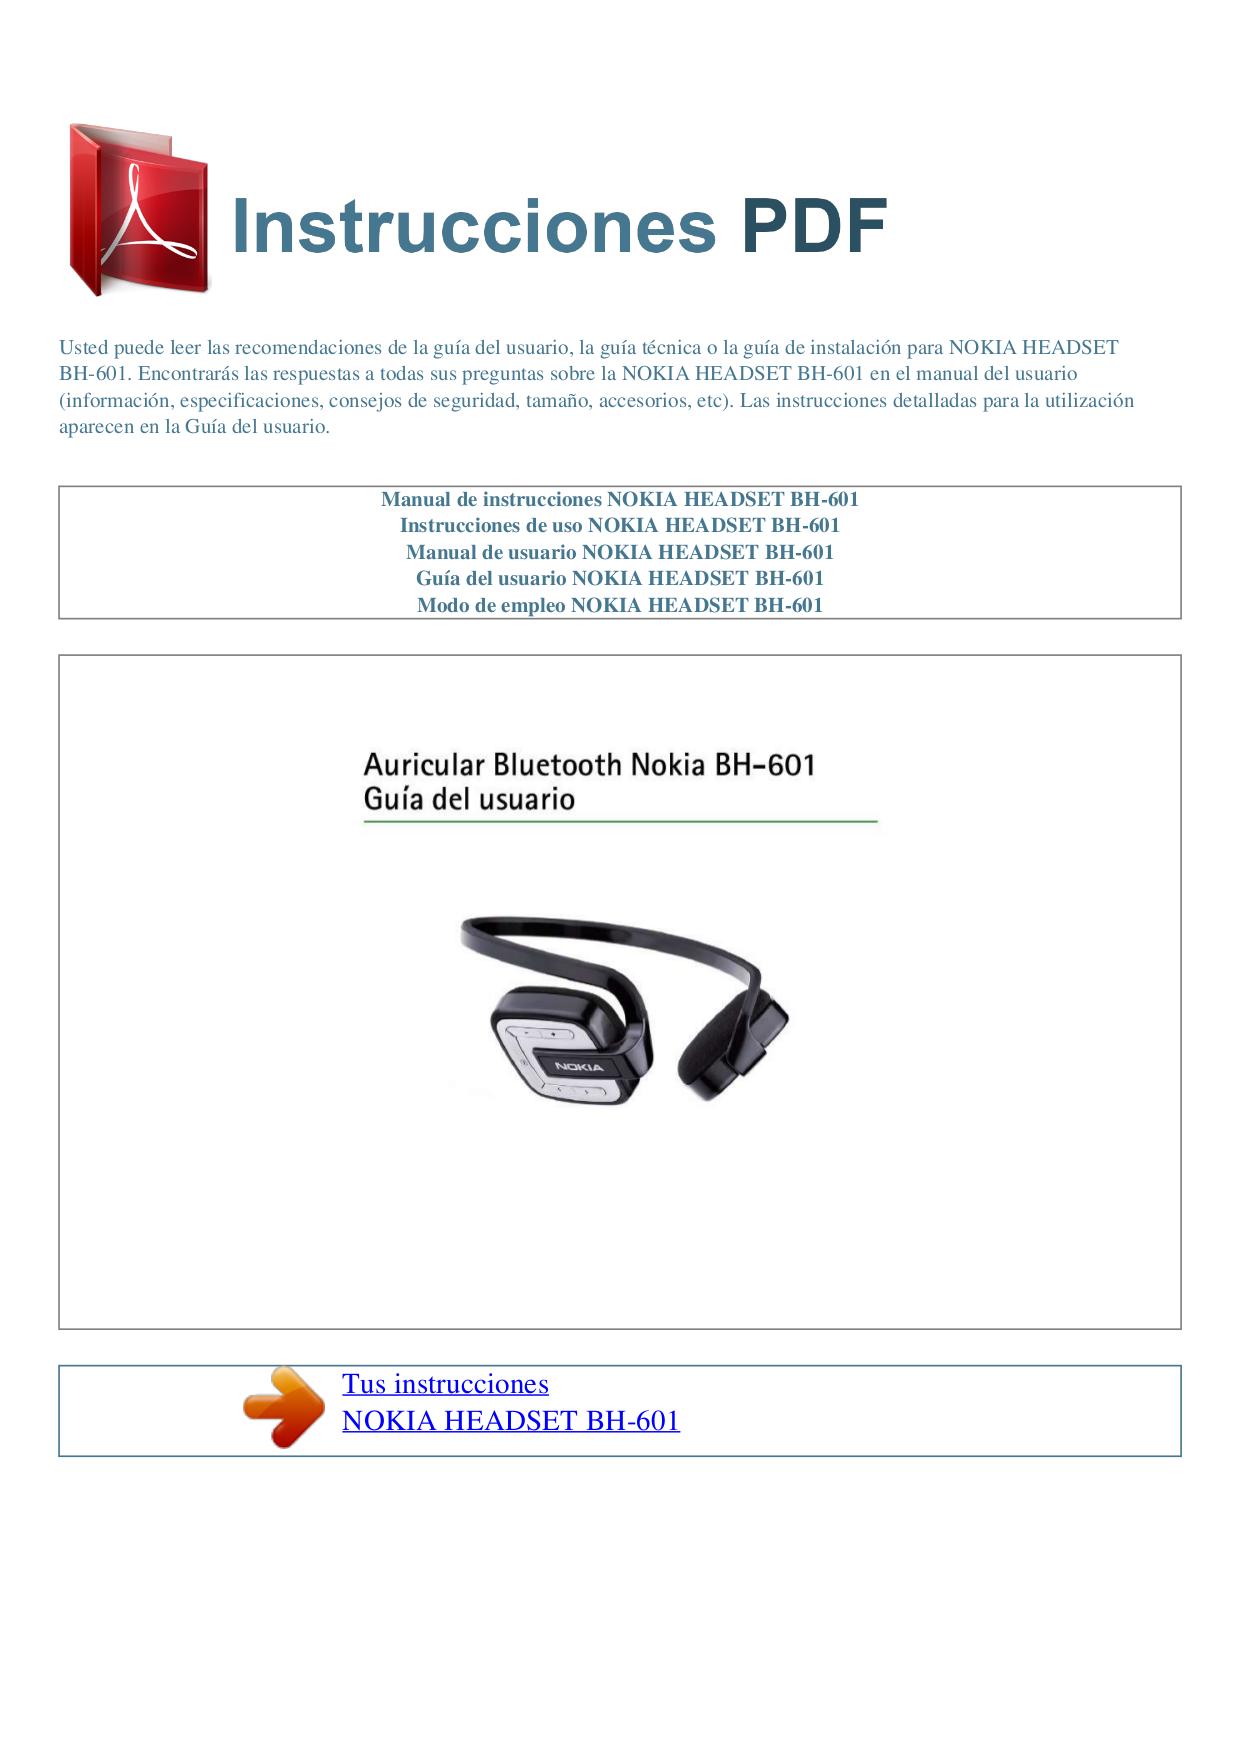 pdf for Nokia Headset BH-601 manual